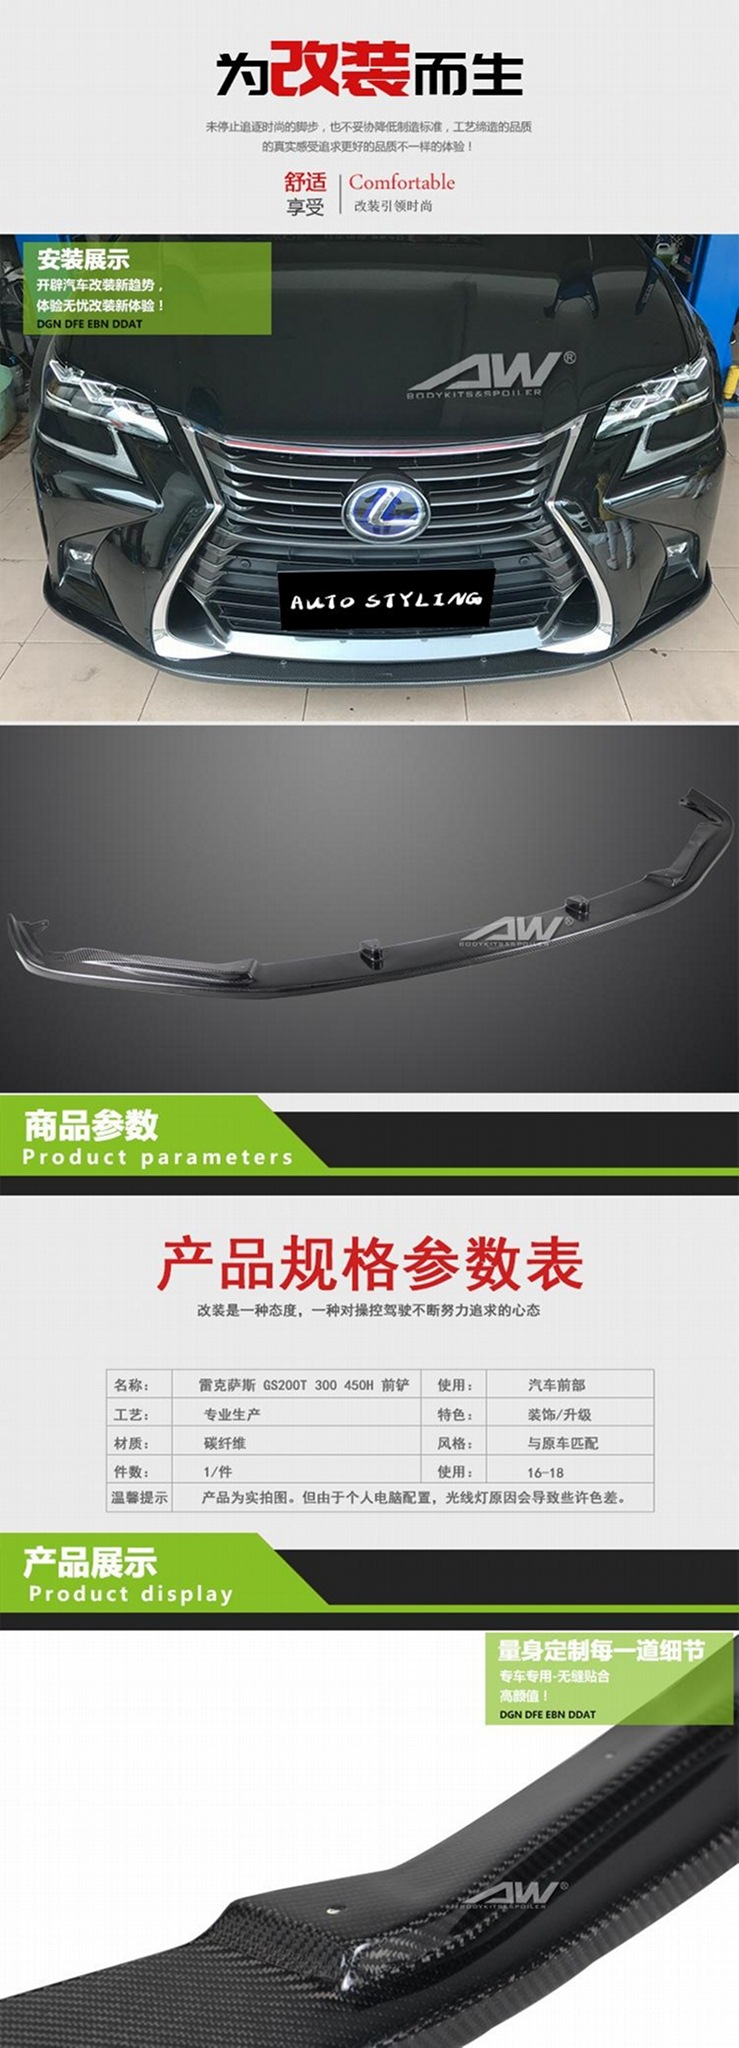 Lexus GS200T 300 450G 16-18 lip chin Body Kits carbon fibre Car modification 5